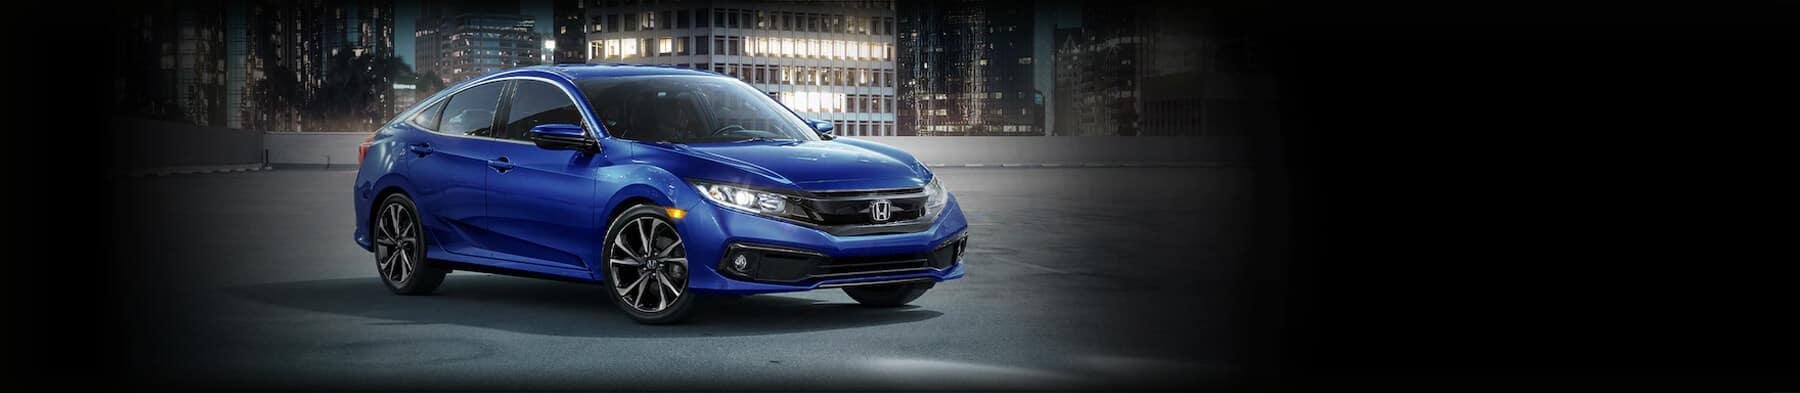 Honda Civic Sedan Awards Hero Image